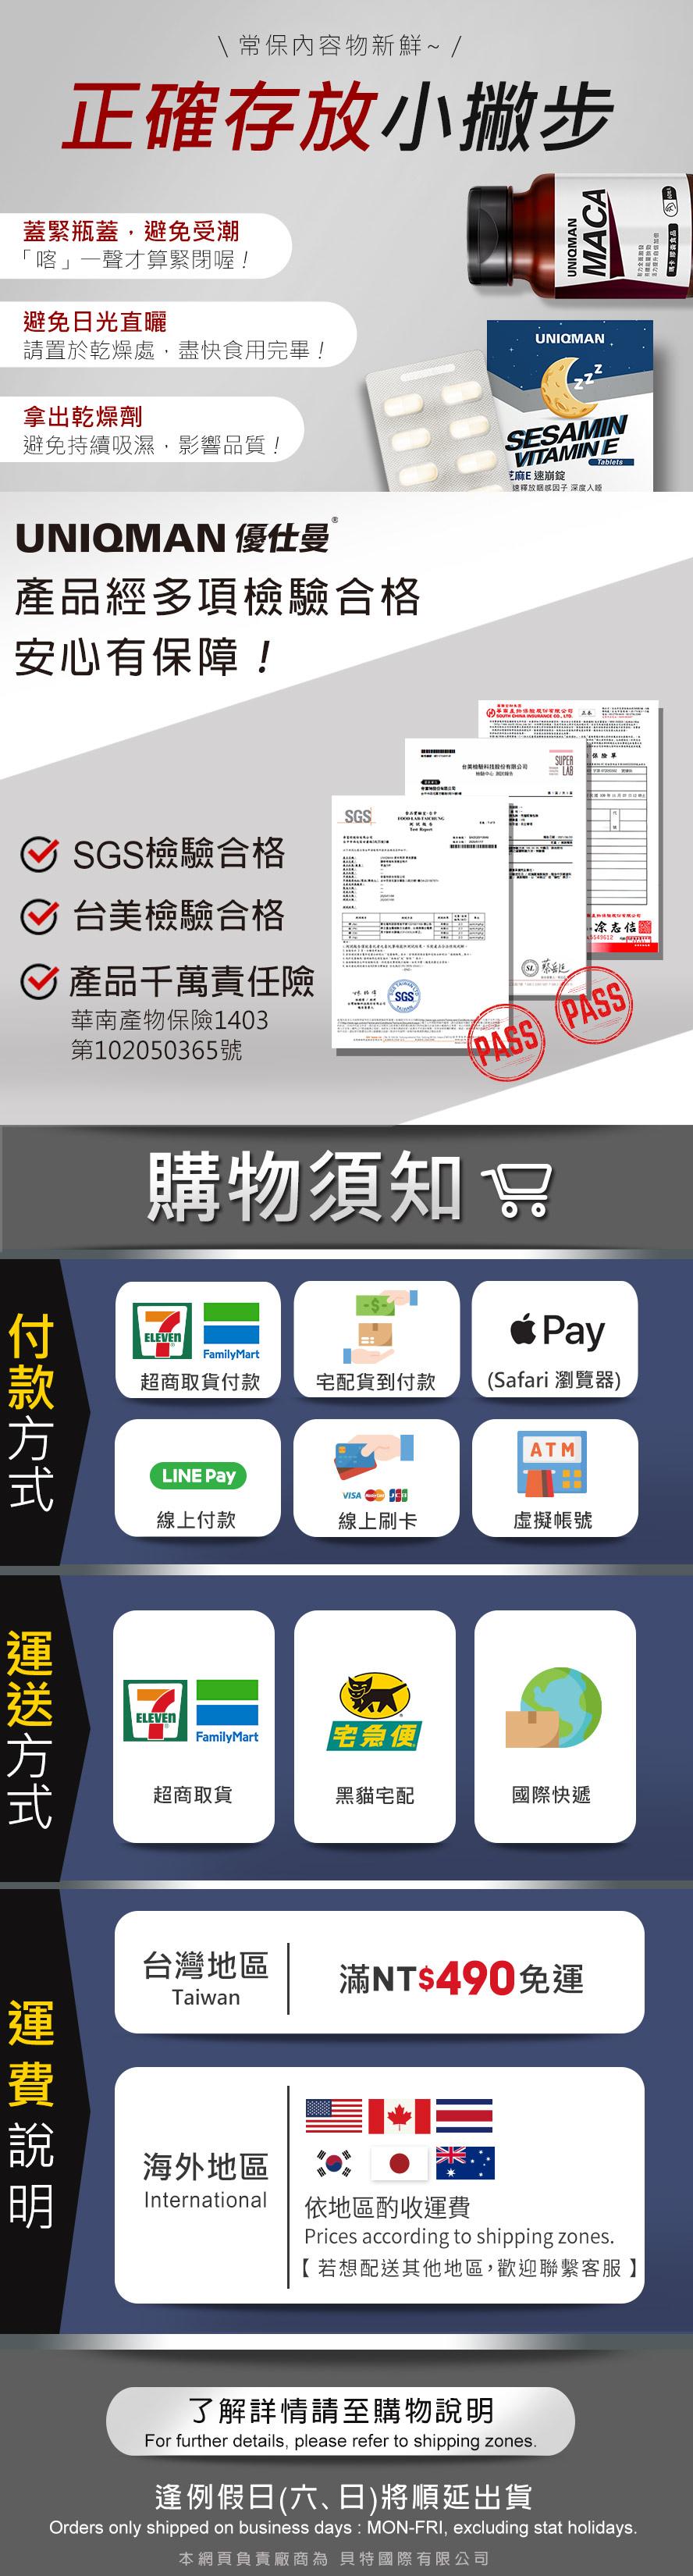 UNIQMAN是台灣第一的男性保健品牌